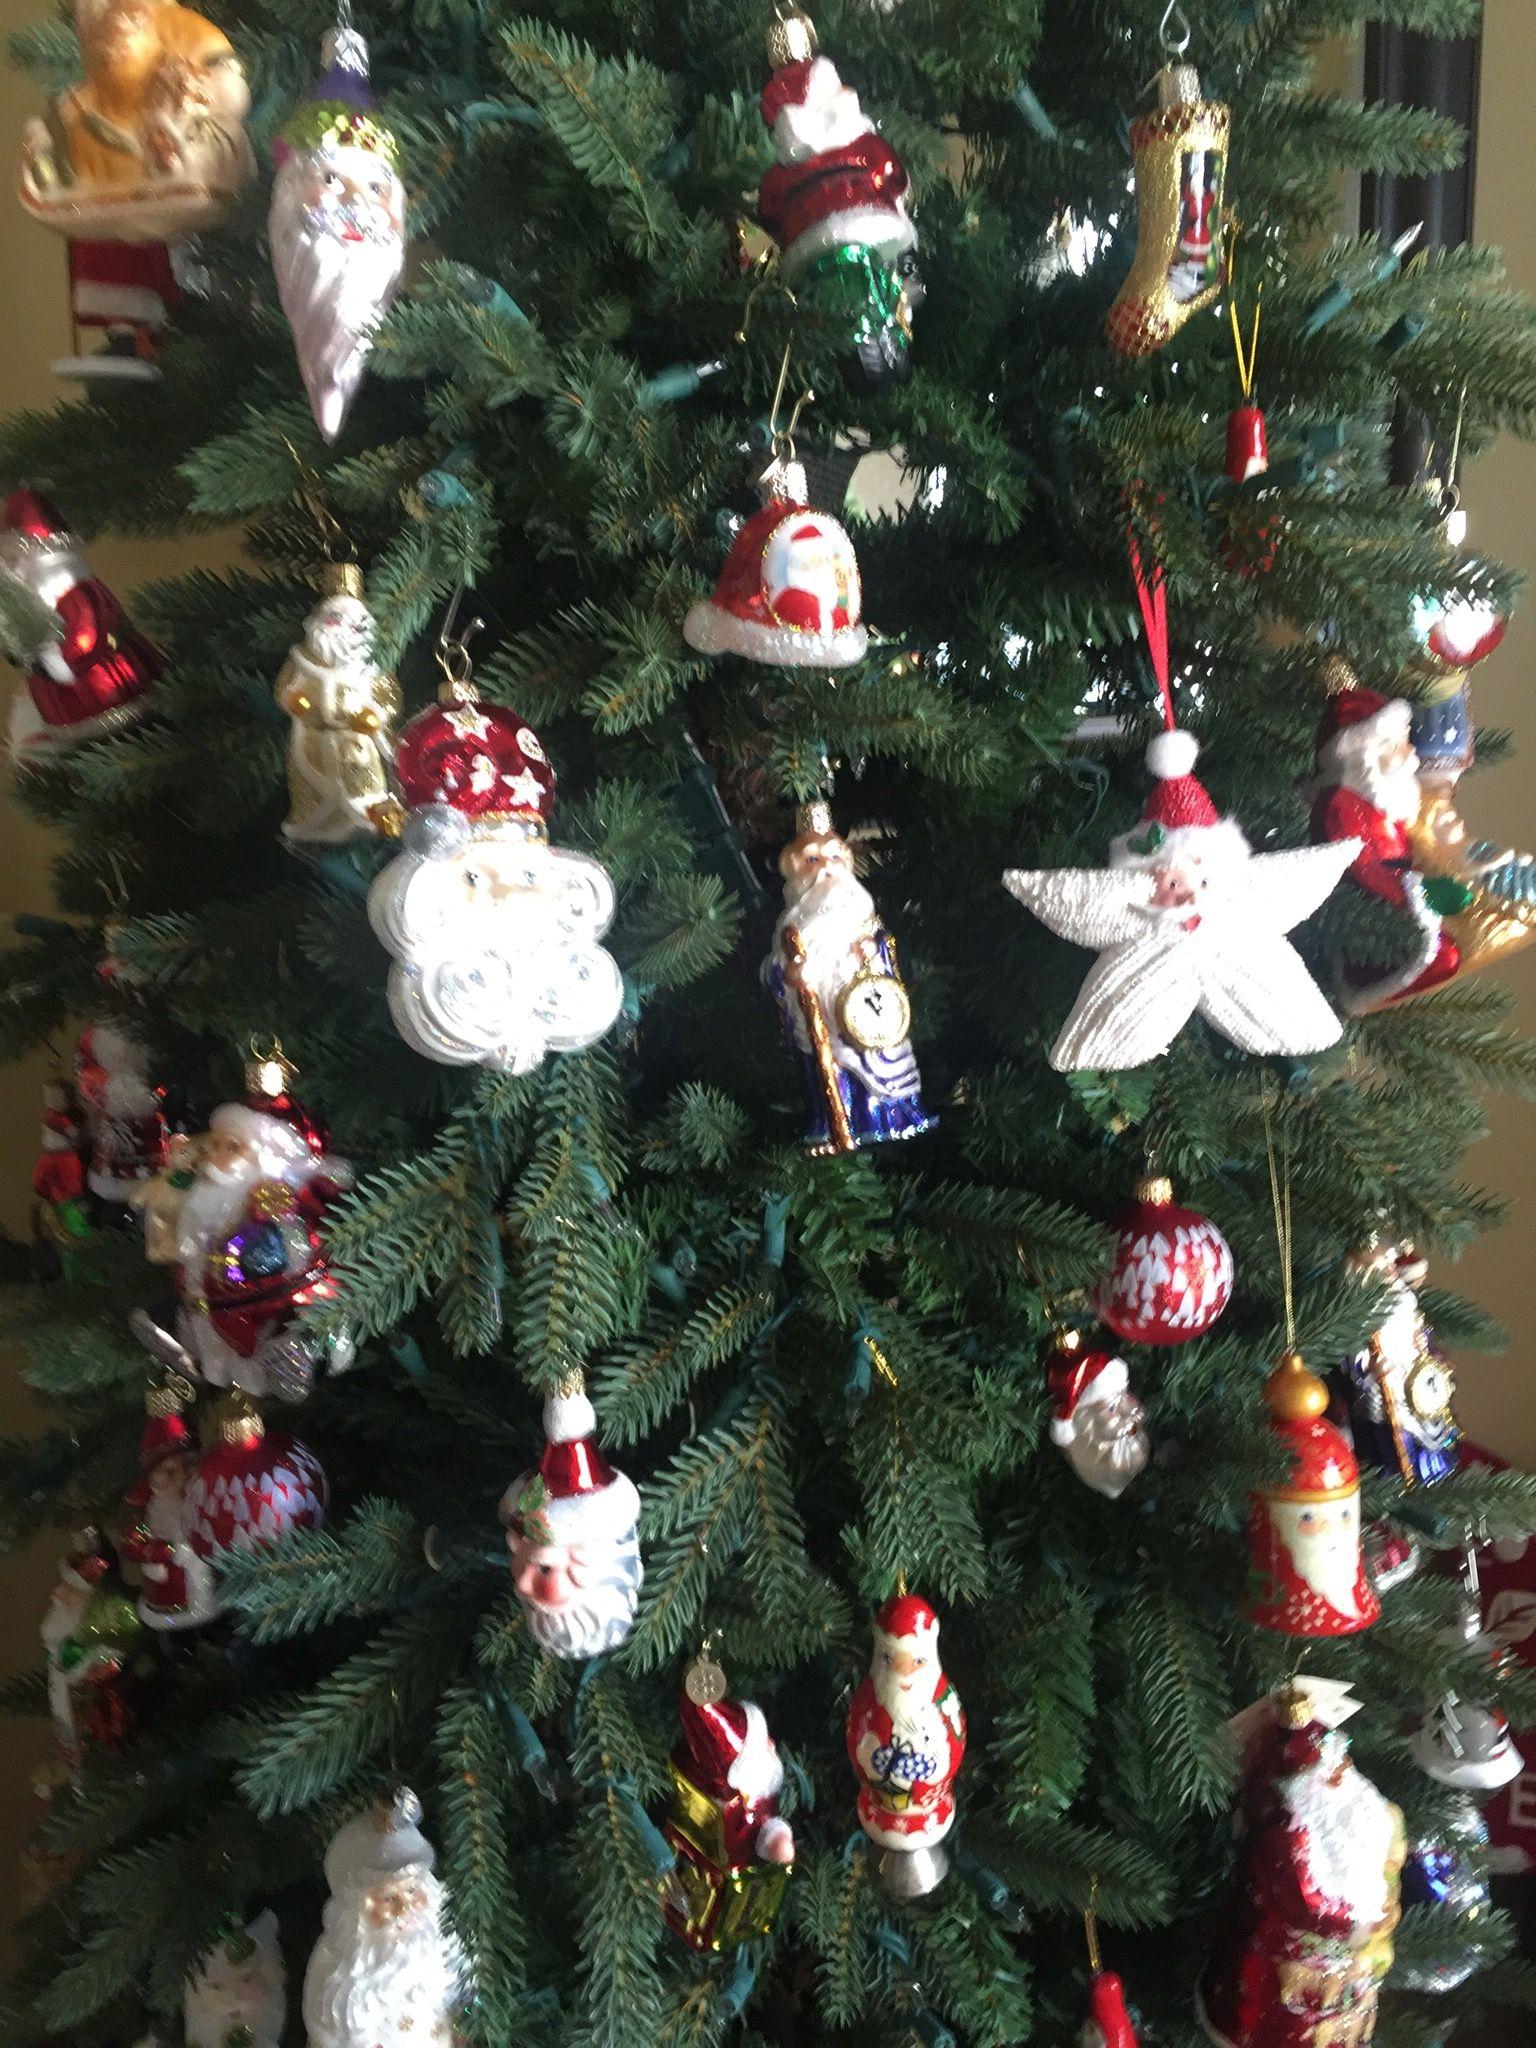 Pin by Janet Kriescher Rohlf on Christmas decorations